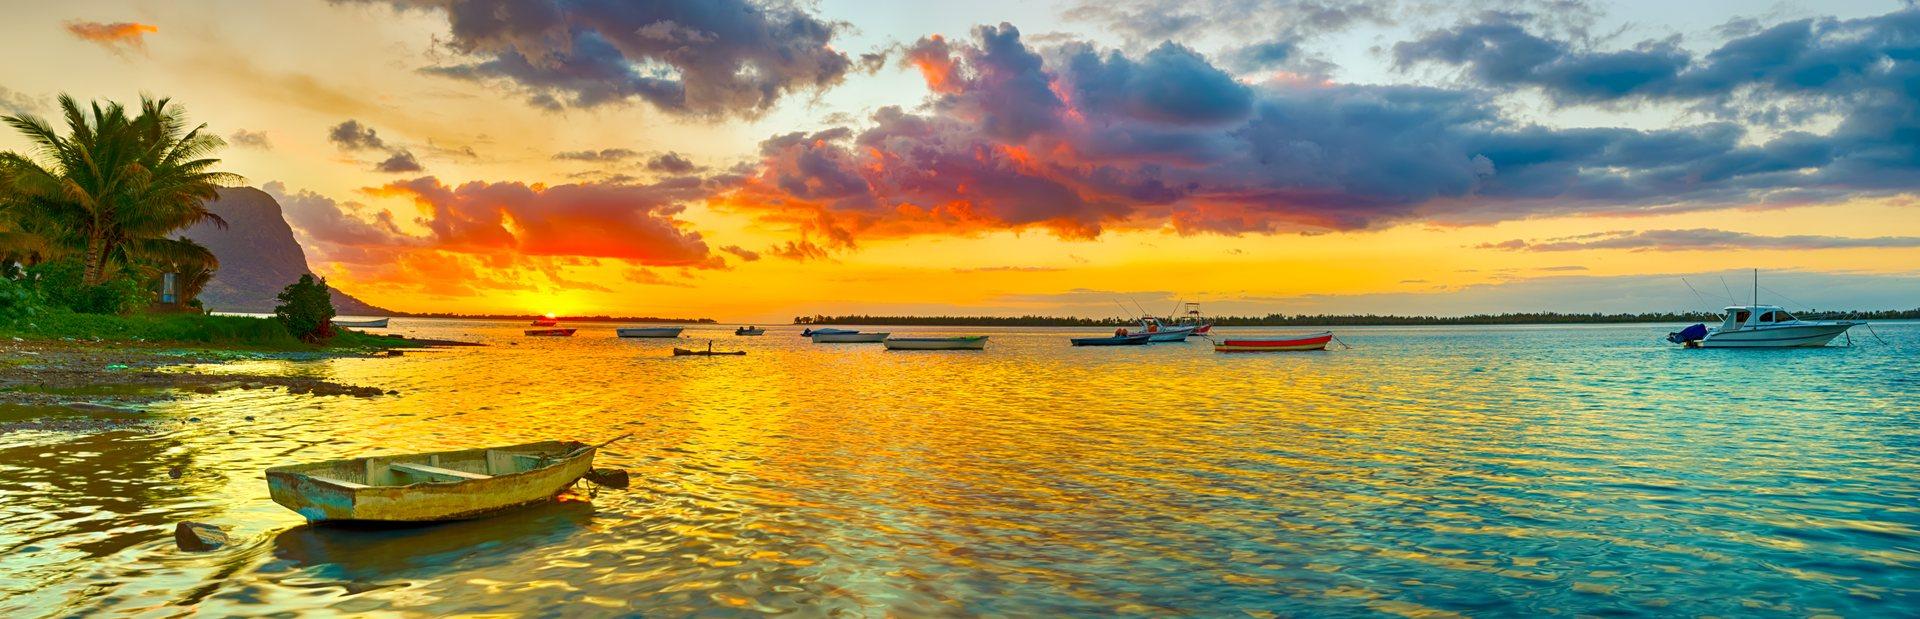 Indian Ocean charter itineraries